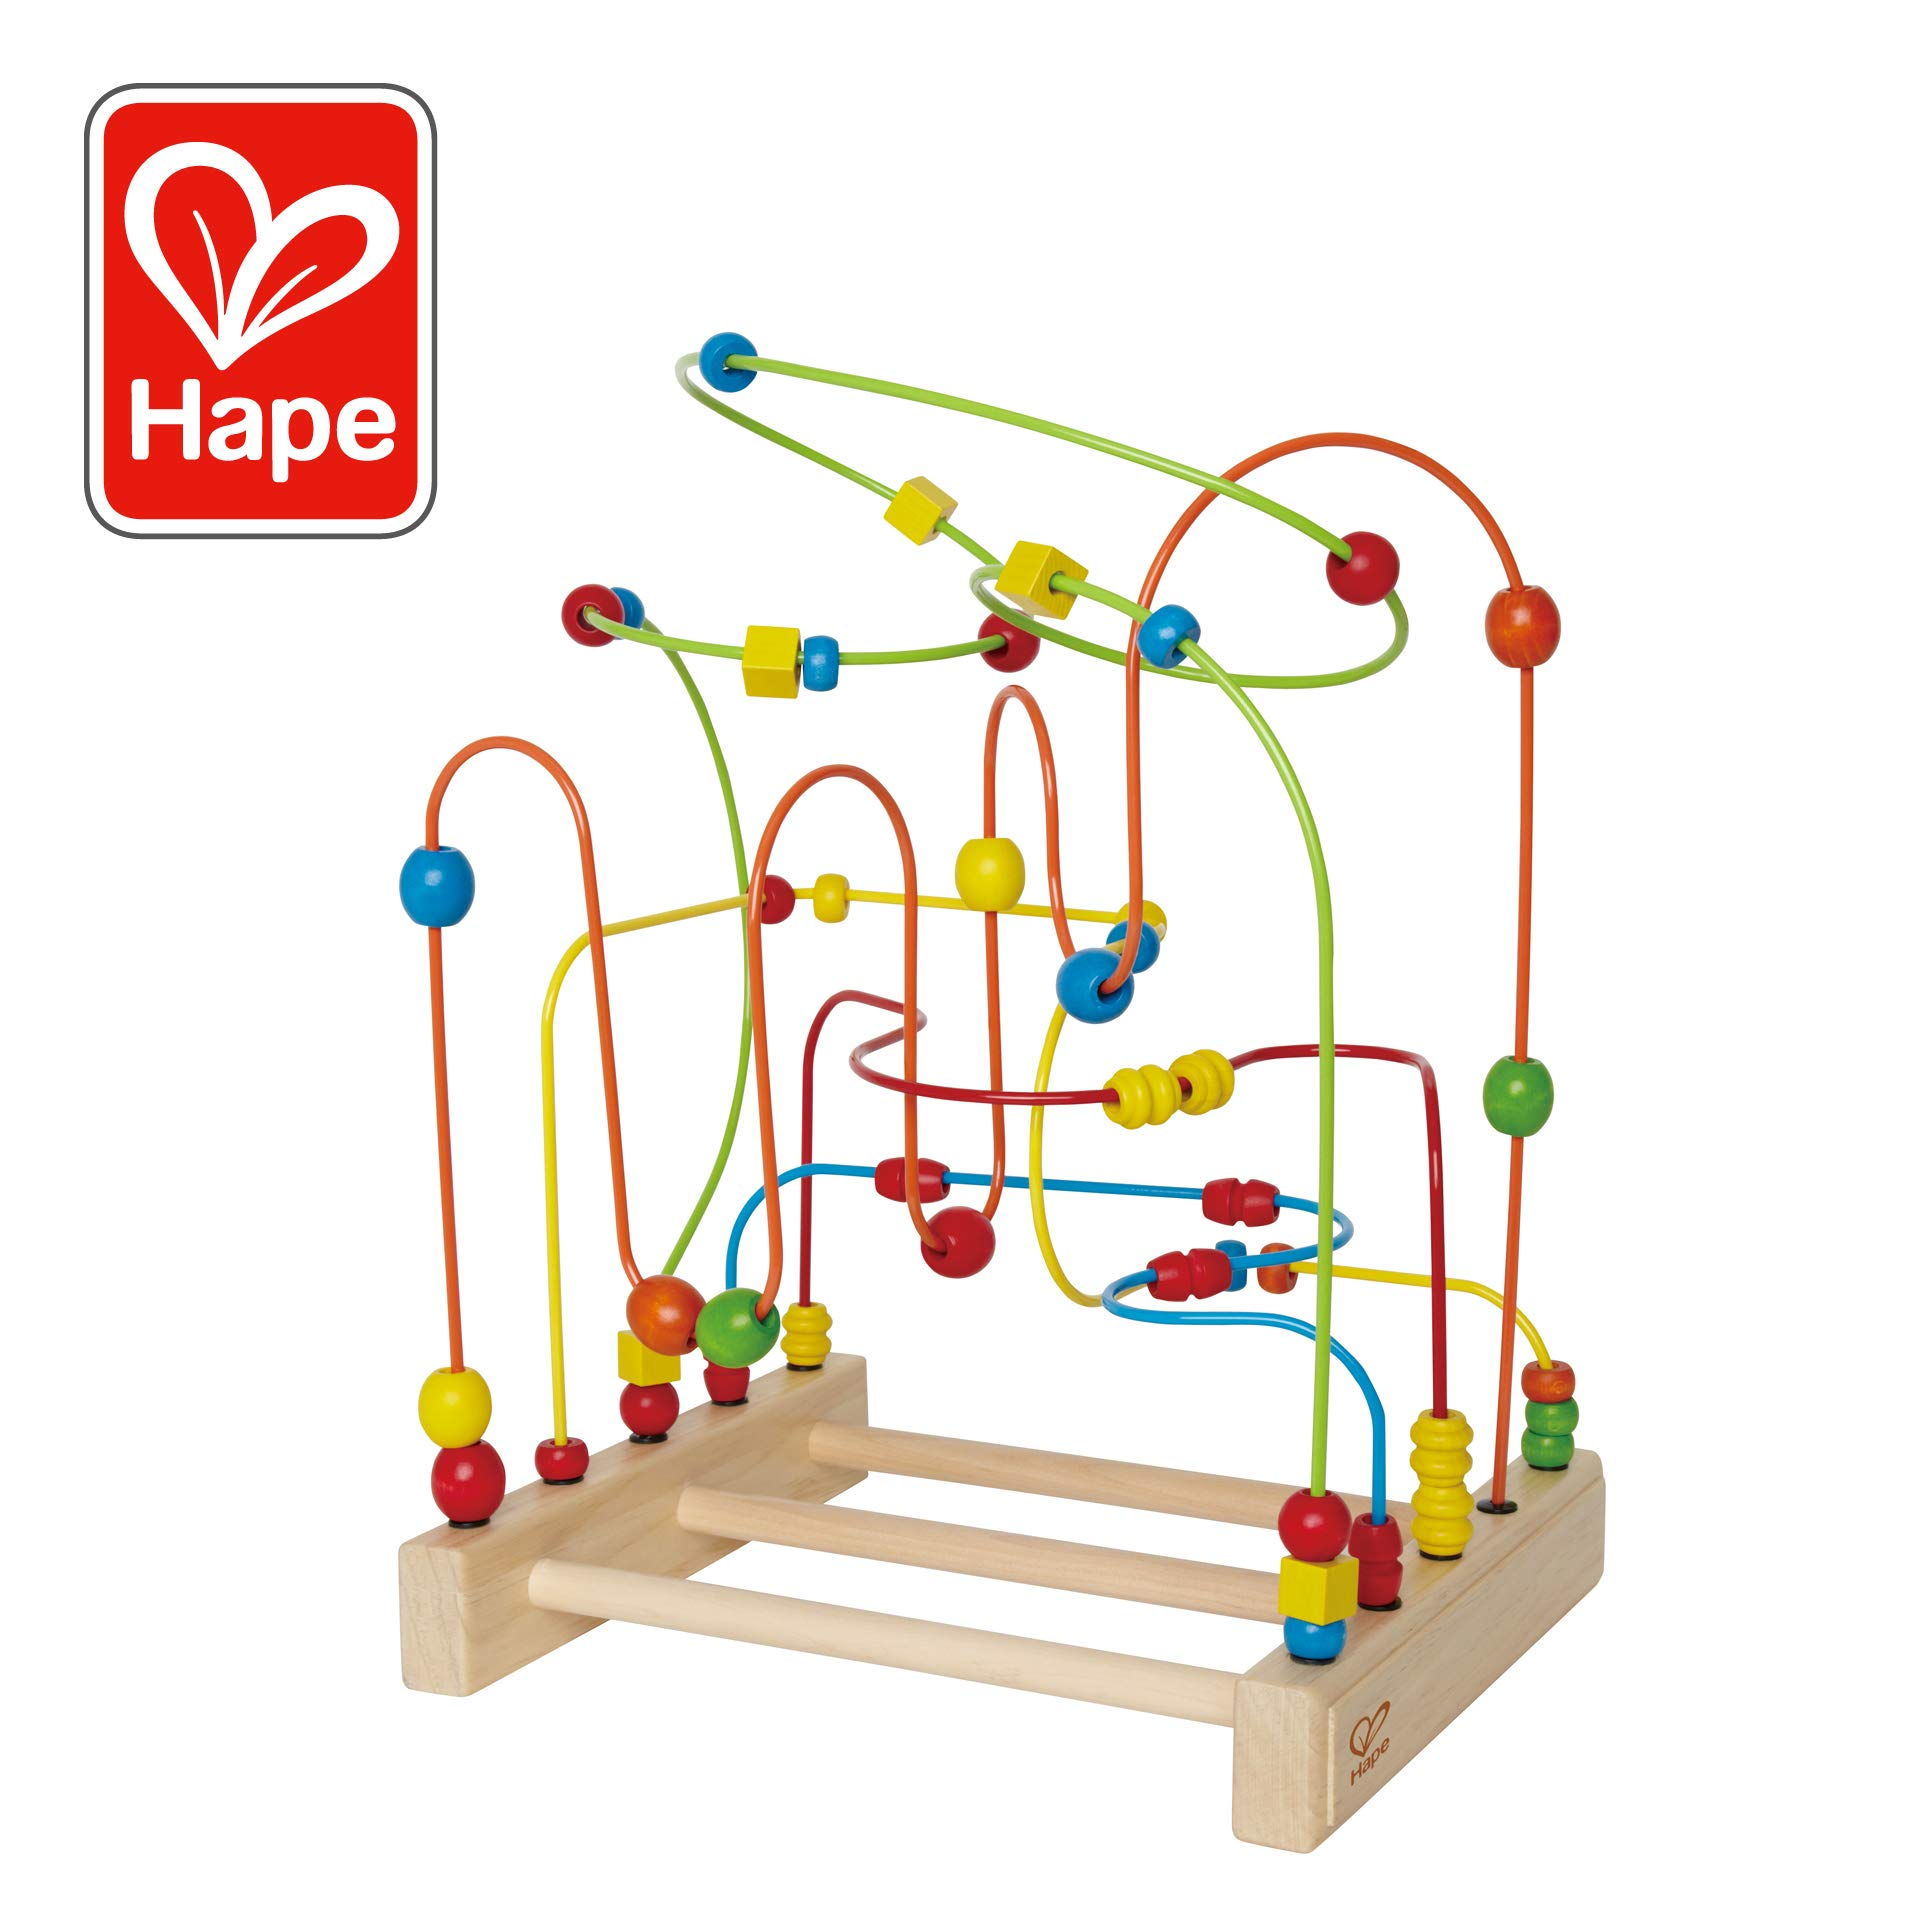 Award Winning Hape Original Supermaze Wooden Bead Activity Learning Center